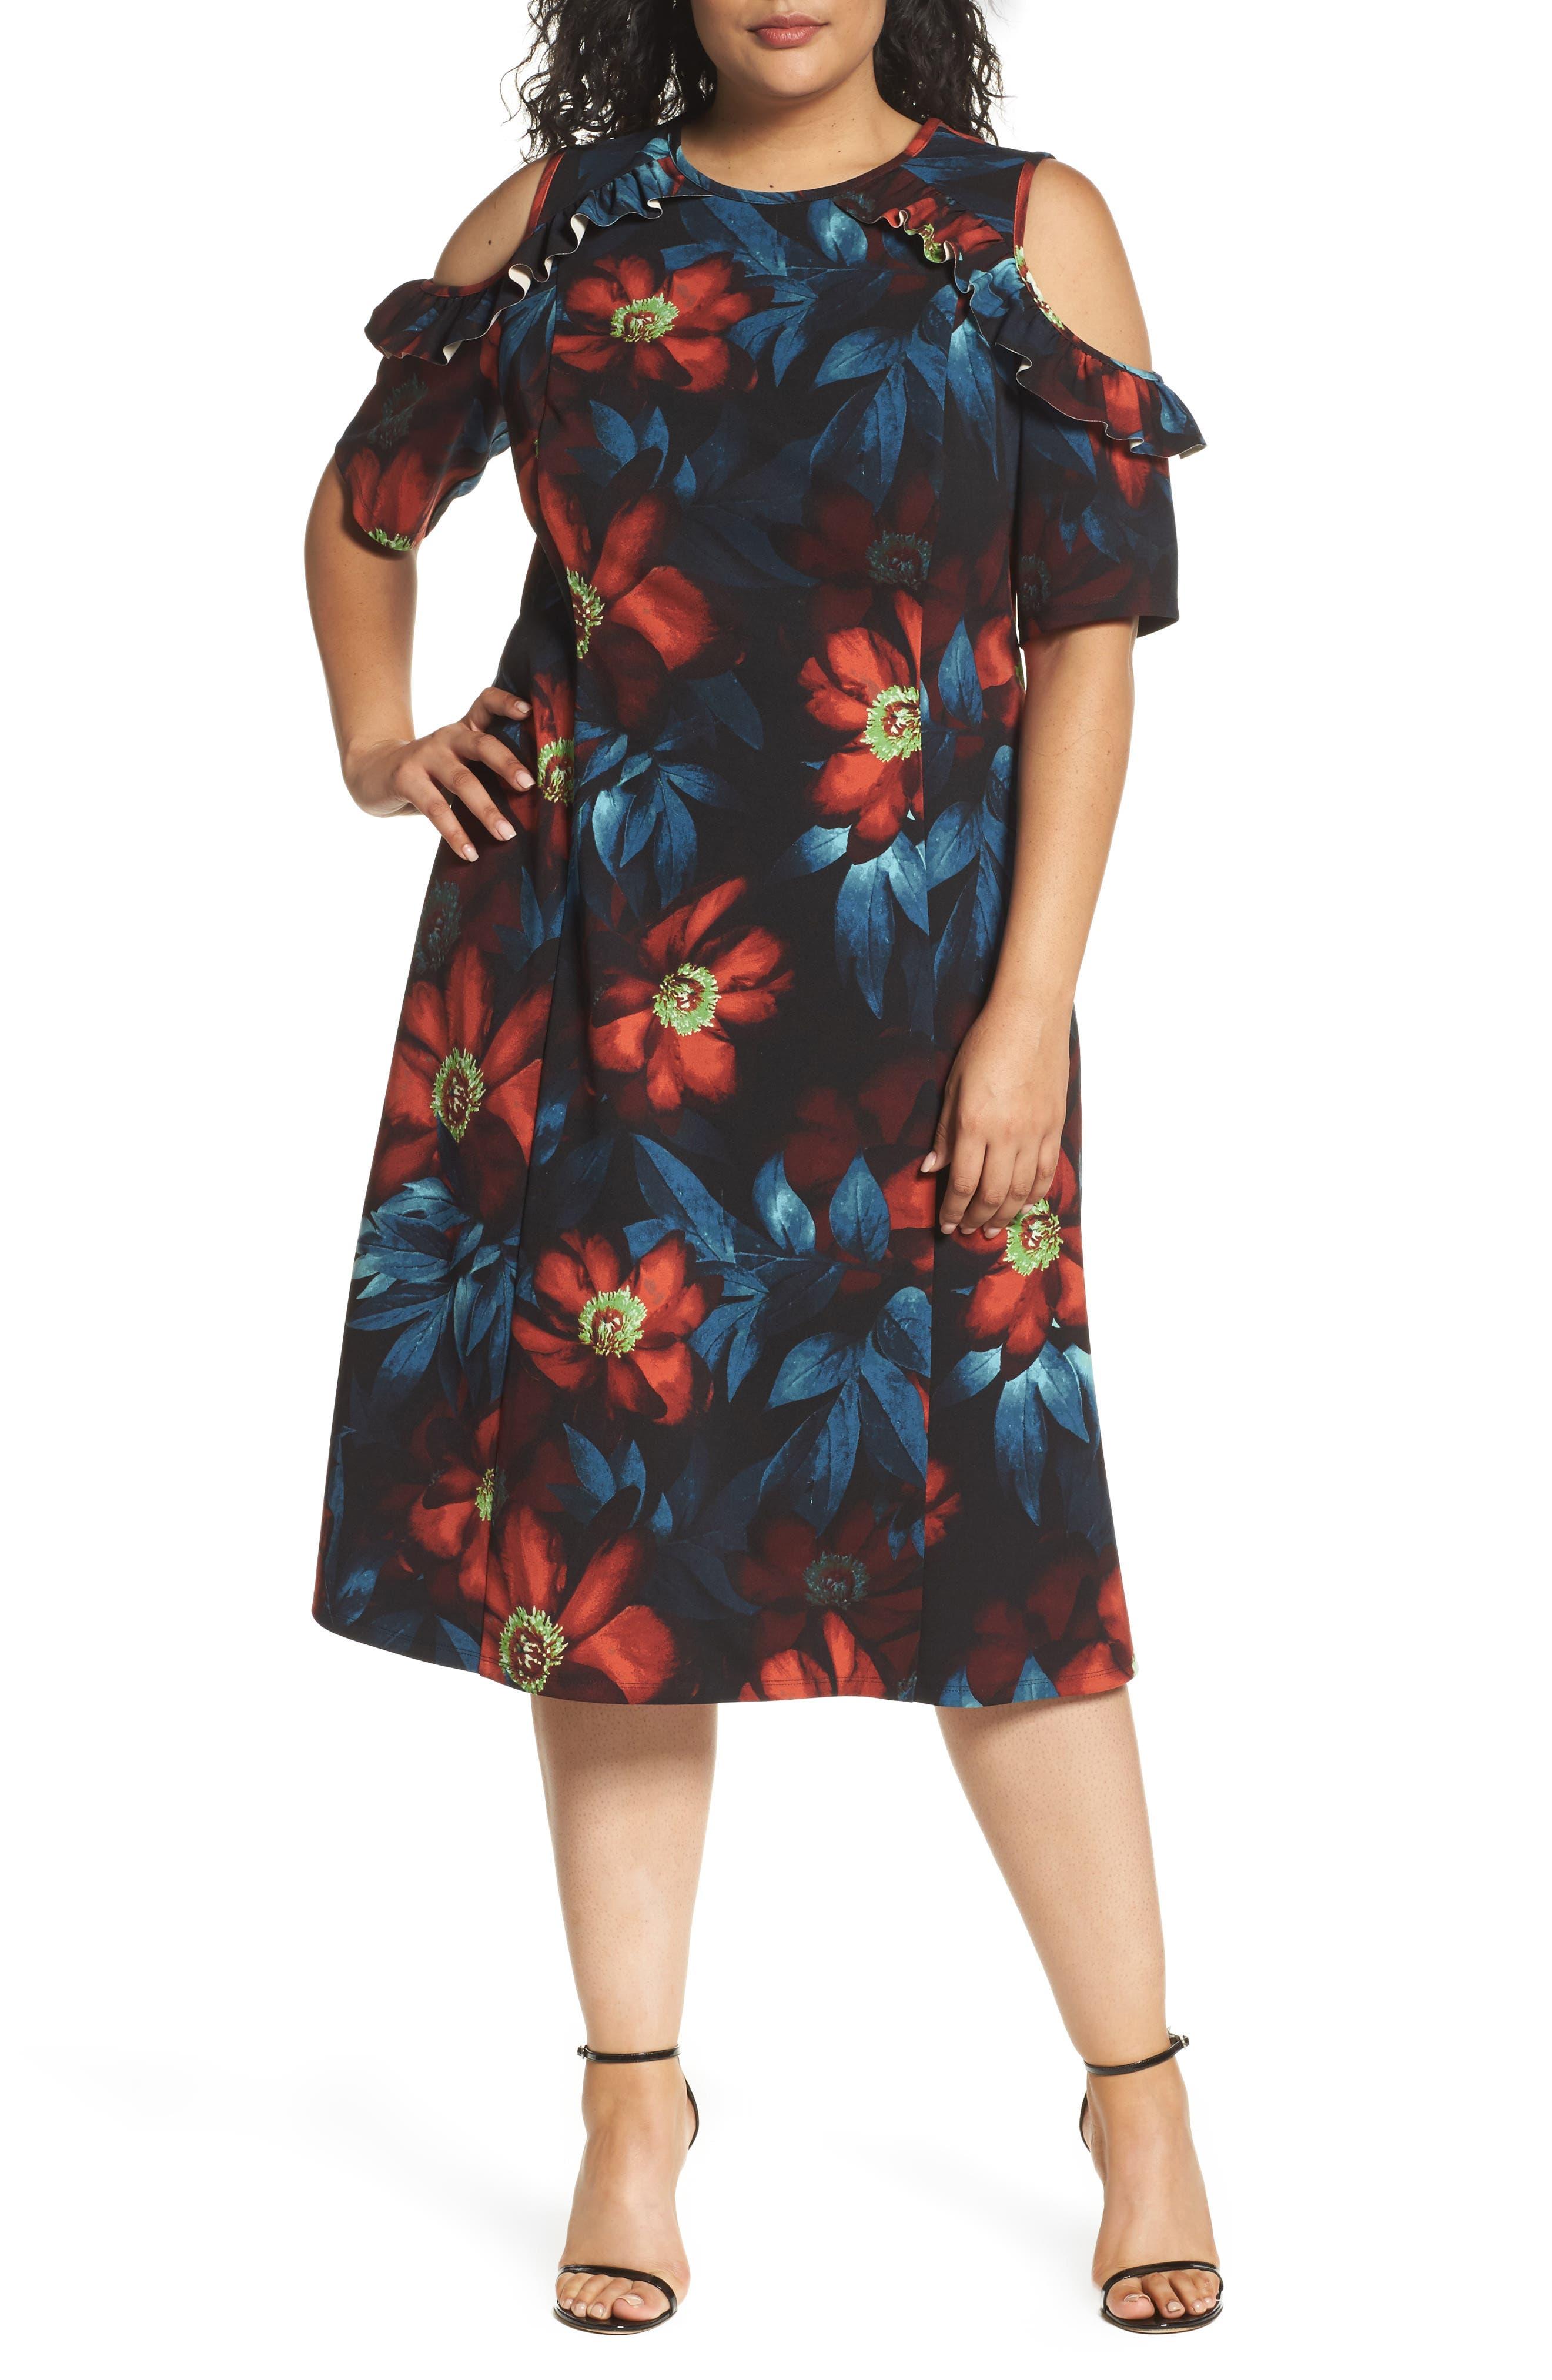 Alternate Image 1 Selected - London Times Cold Shoulder Floral A-Line Dress (Plus Size)